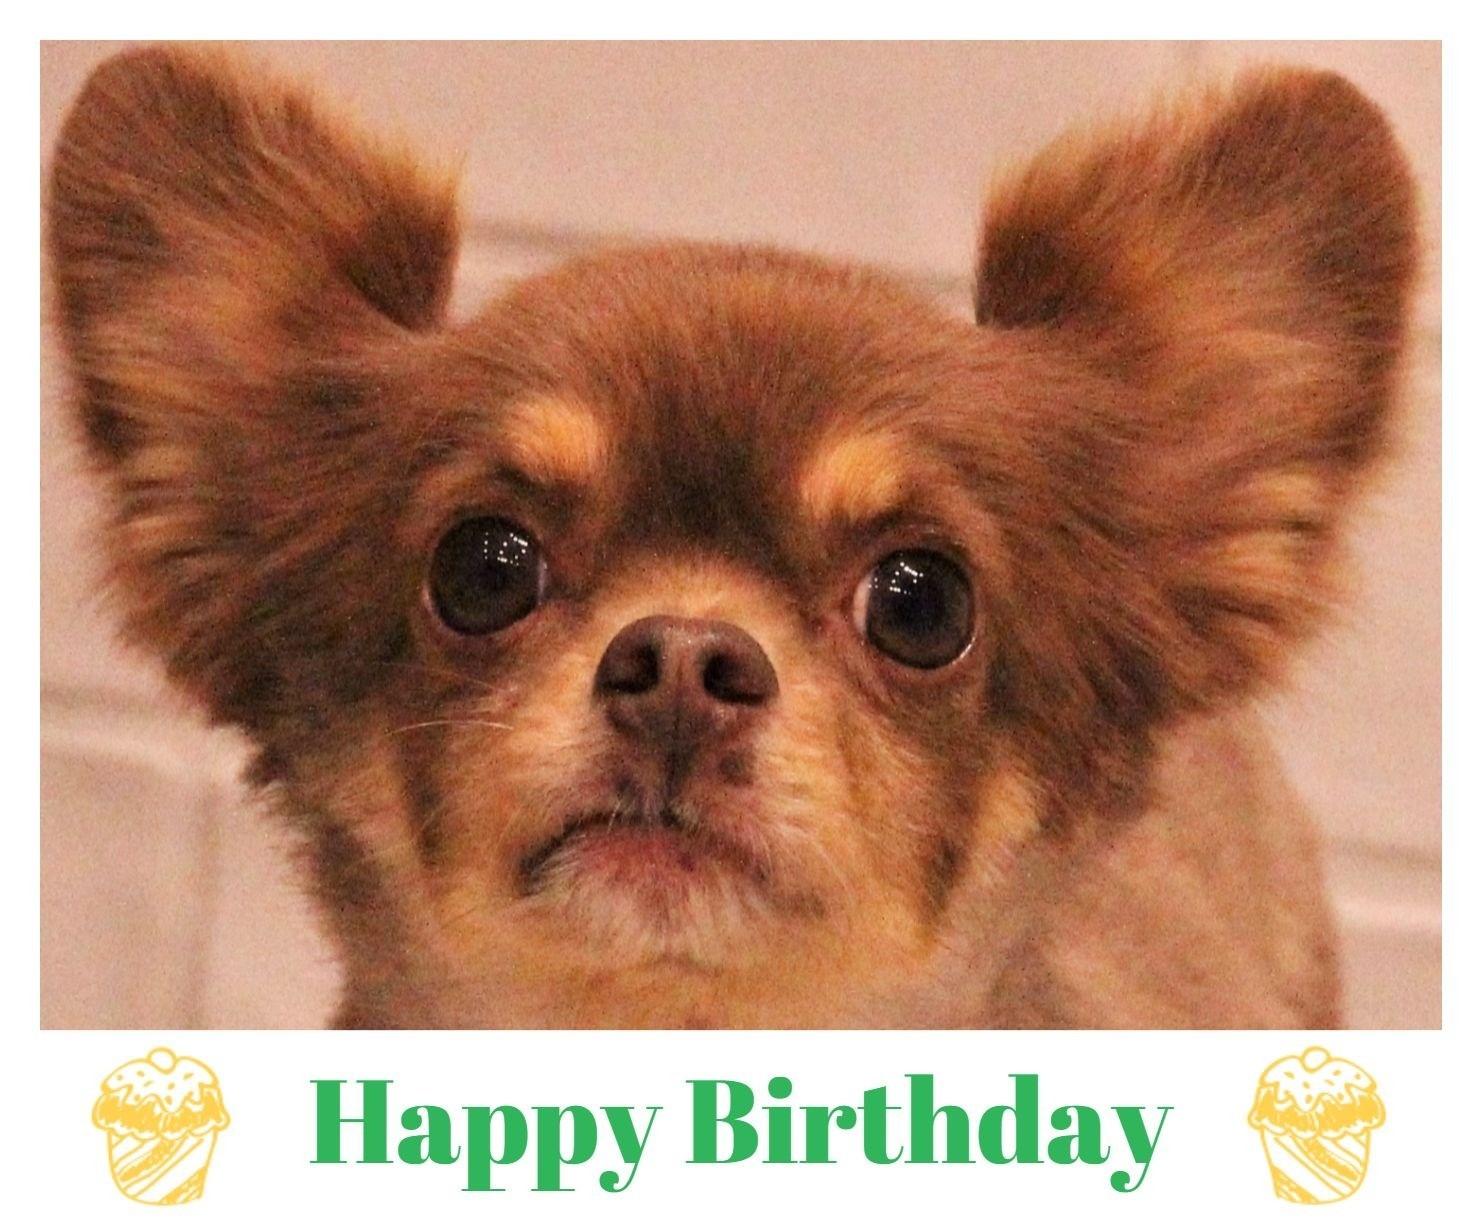 Happy Birthday ♡ トラジロウくん_d0060413_13355875.jpg